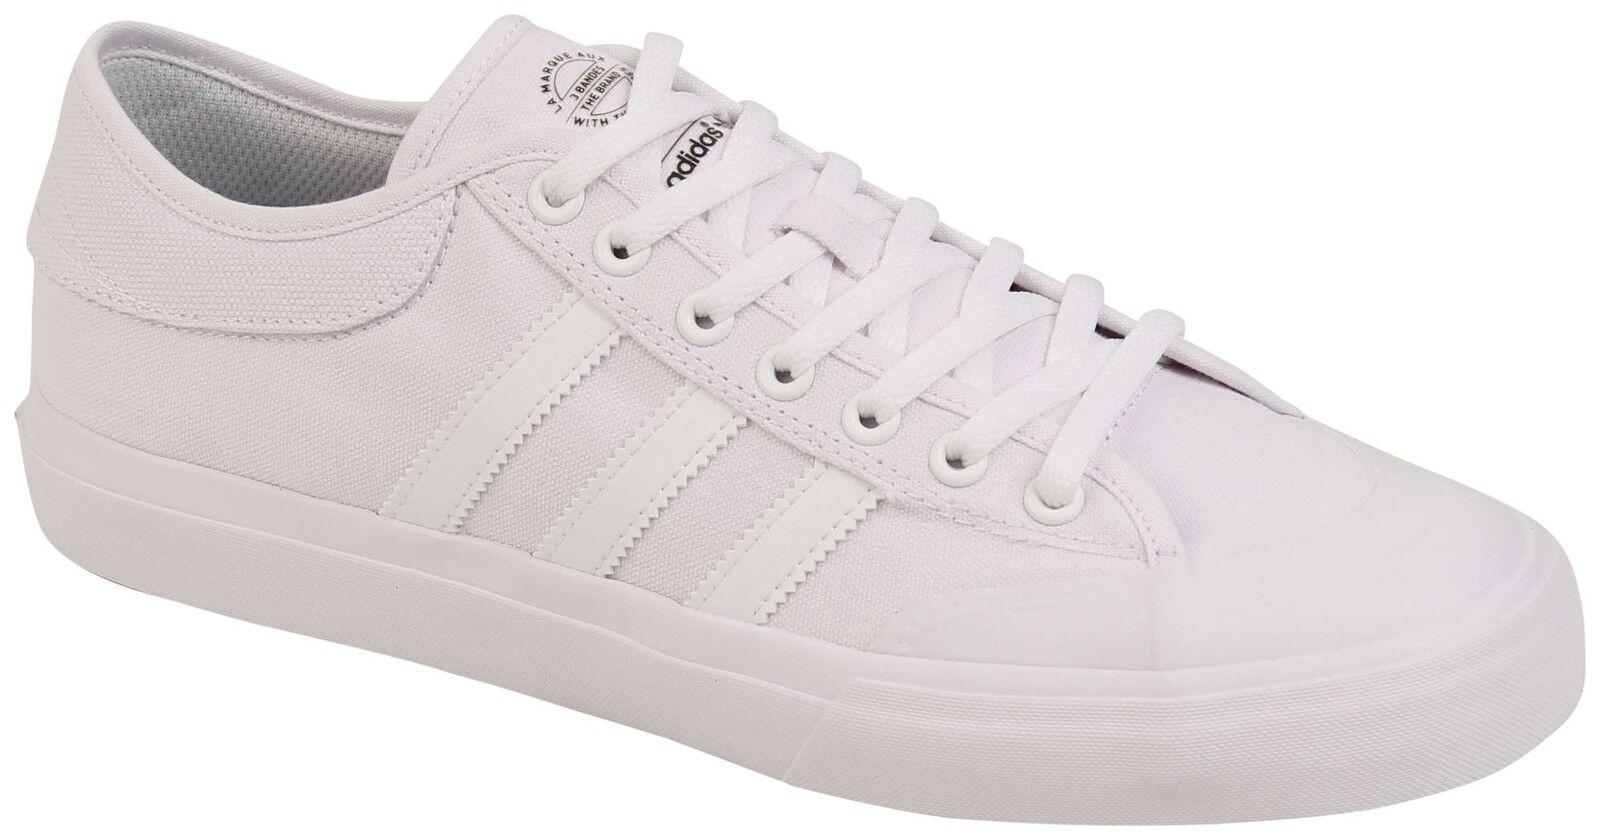 Adidas Matchcourt Shoe - White / White - New